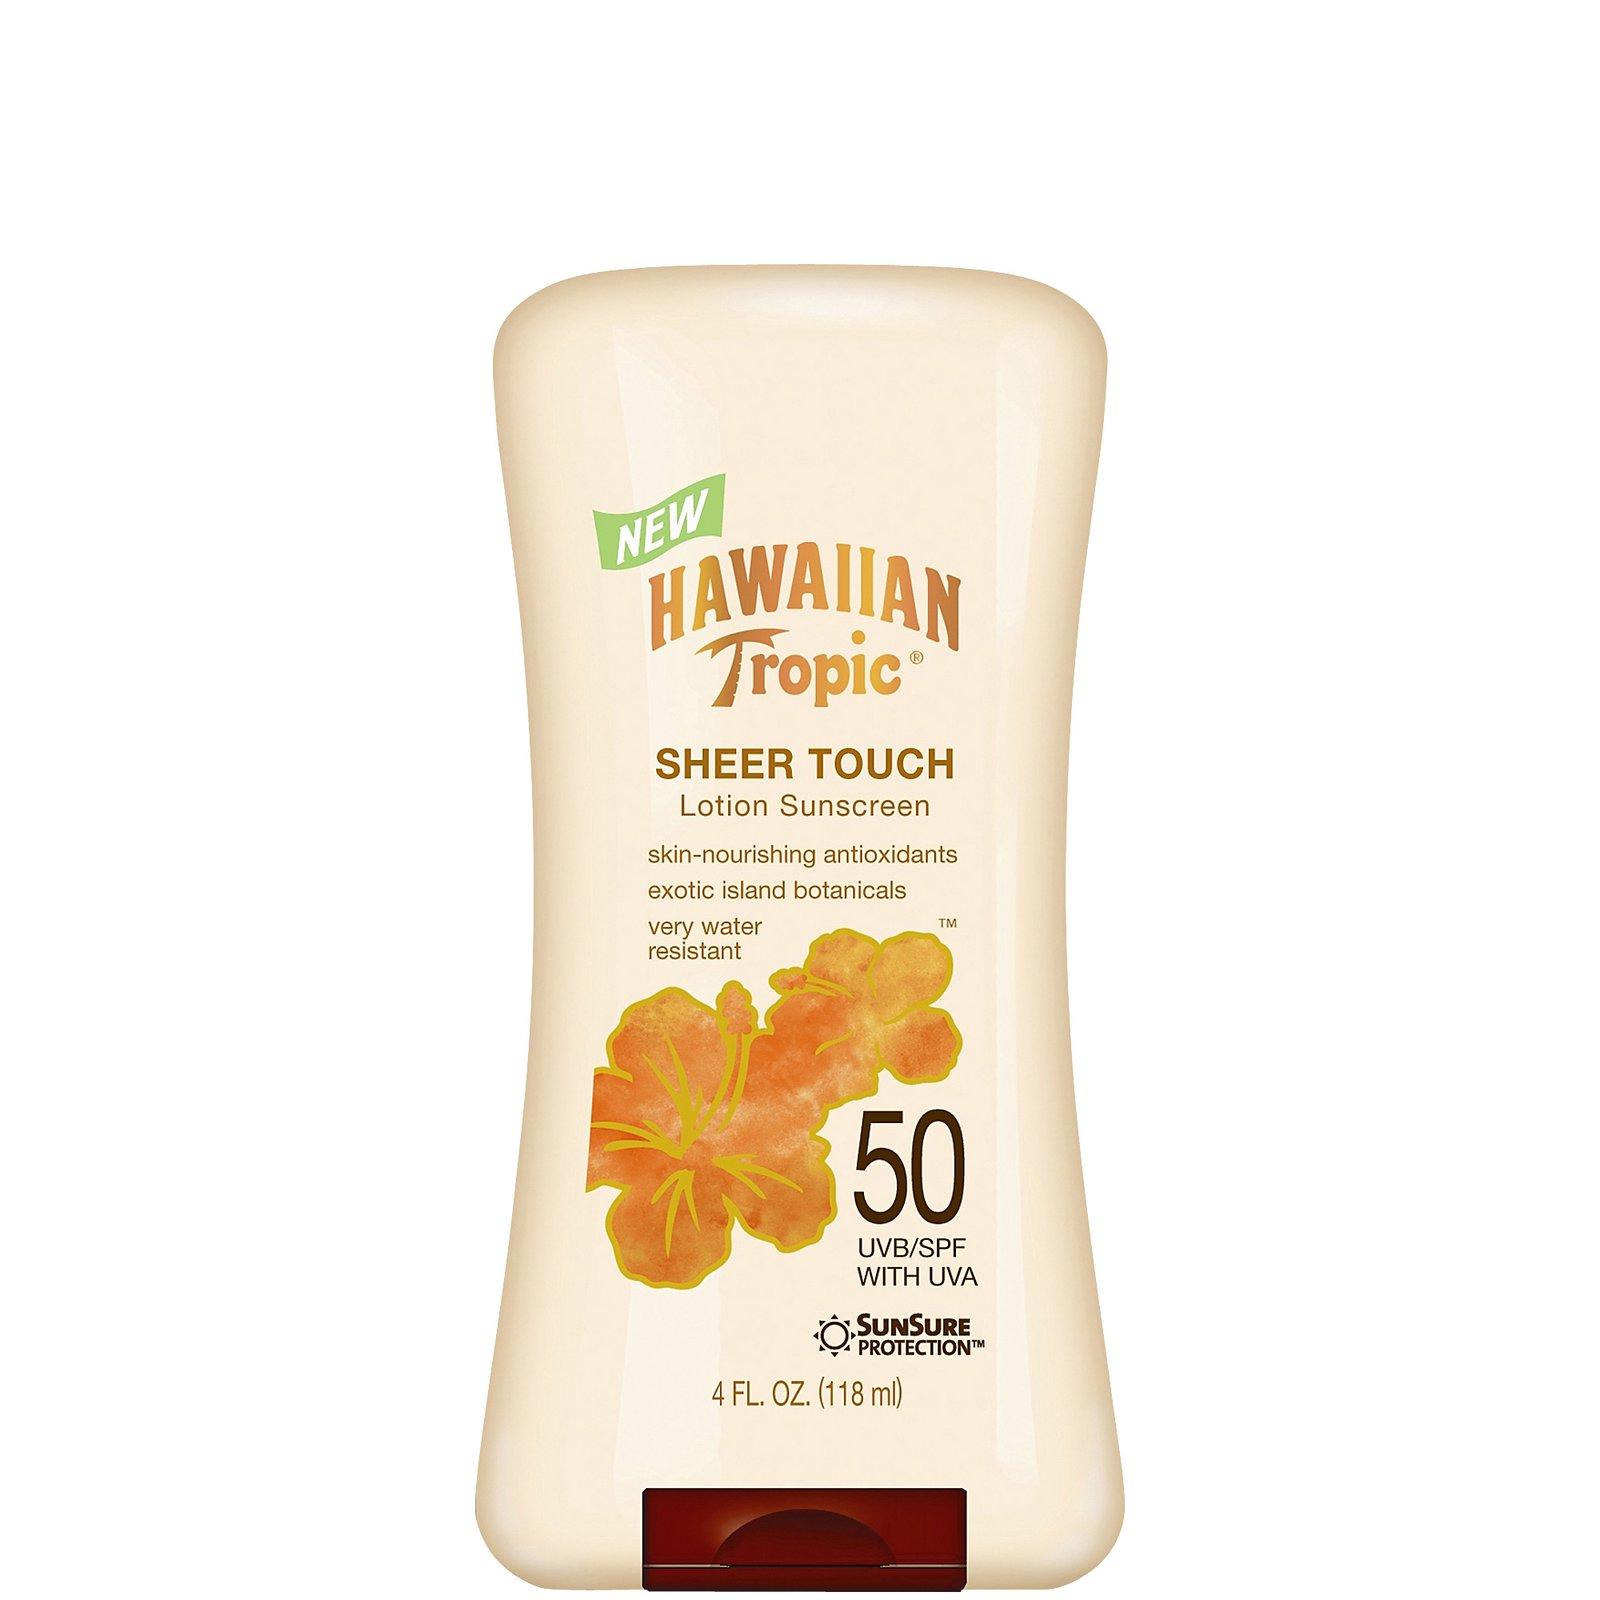 Hawaiian_Tropic_Sheer_Touch